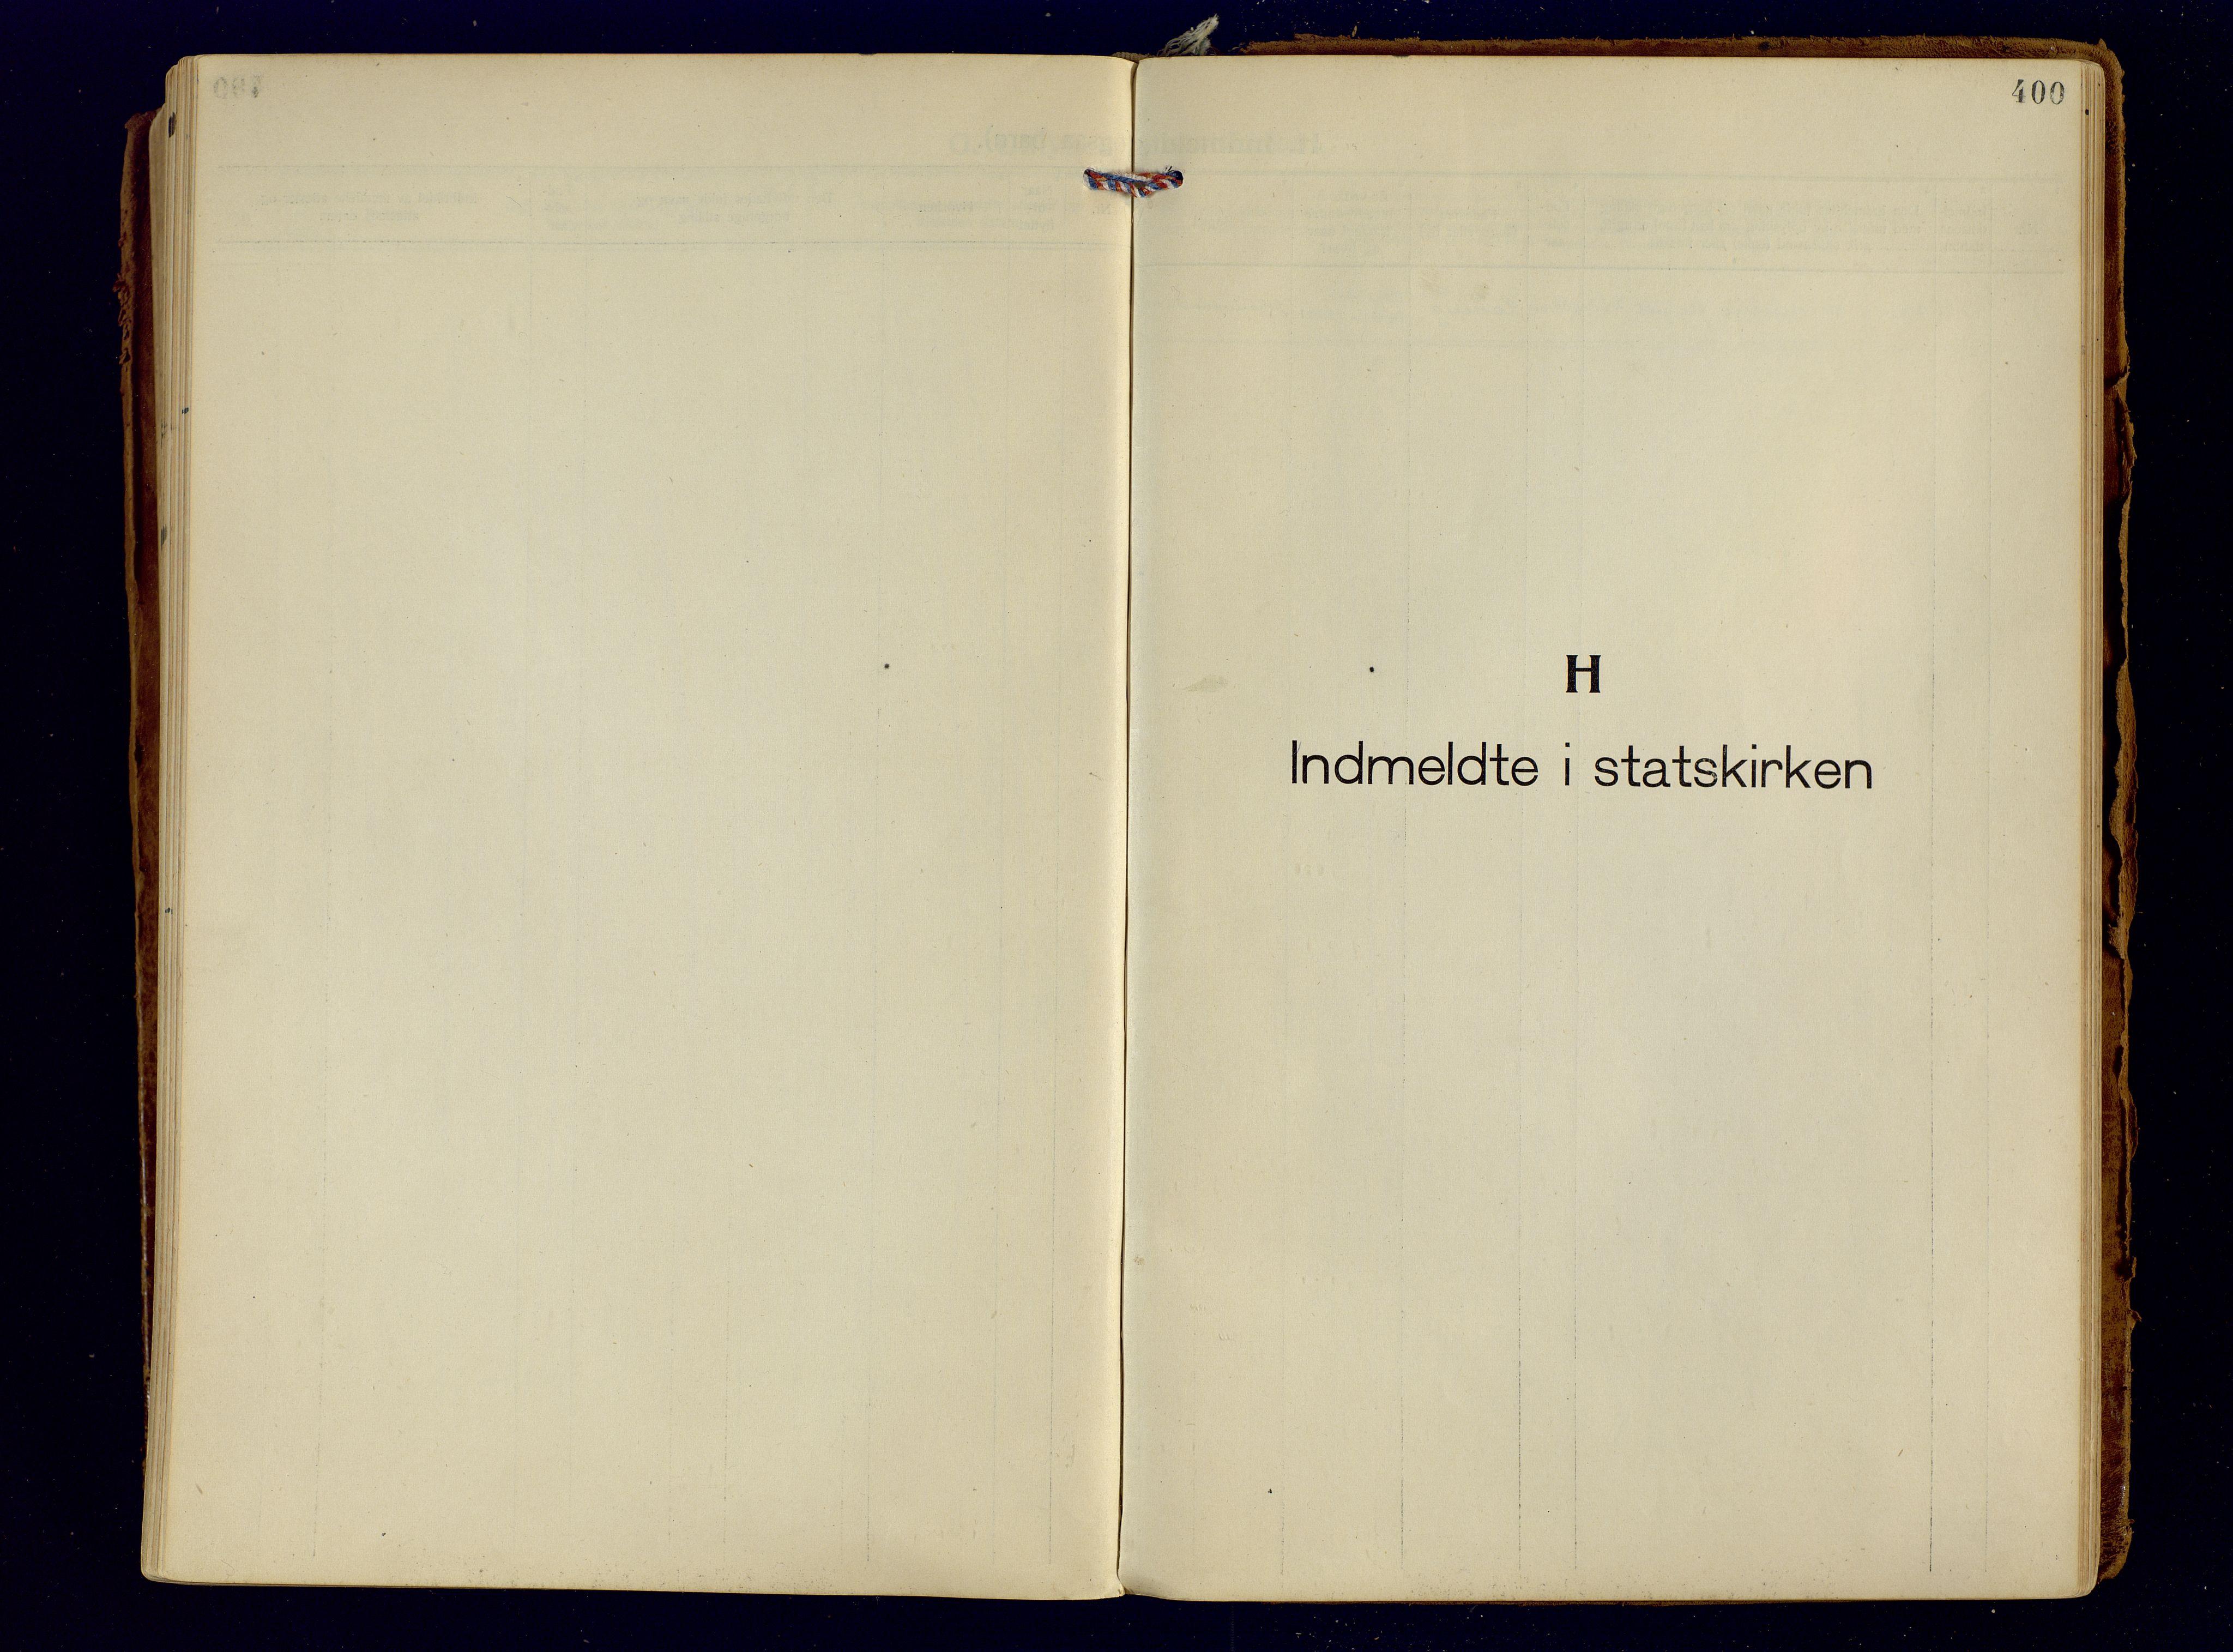 SATØ, Tromsøysund sokneprestkontor, G/Ga: Ministerialbok nr. 9, 1922-1934, s. 400